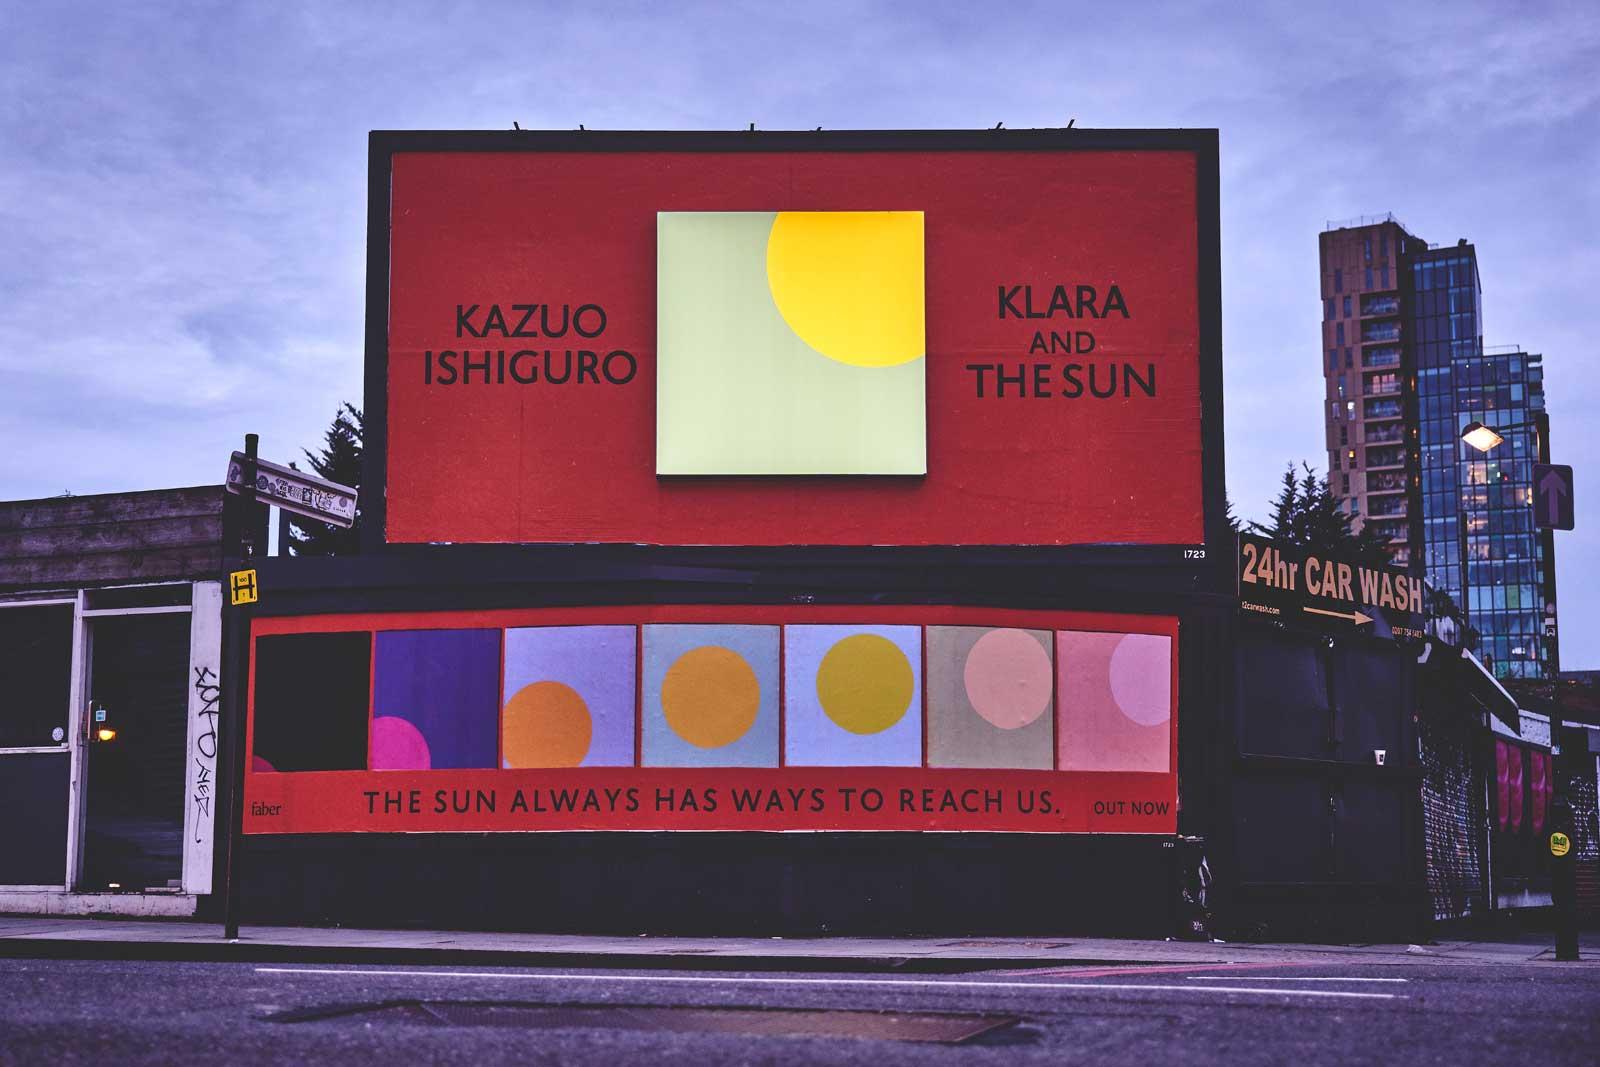 Klara and The Sun: Kazuo Ishiguro